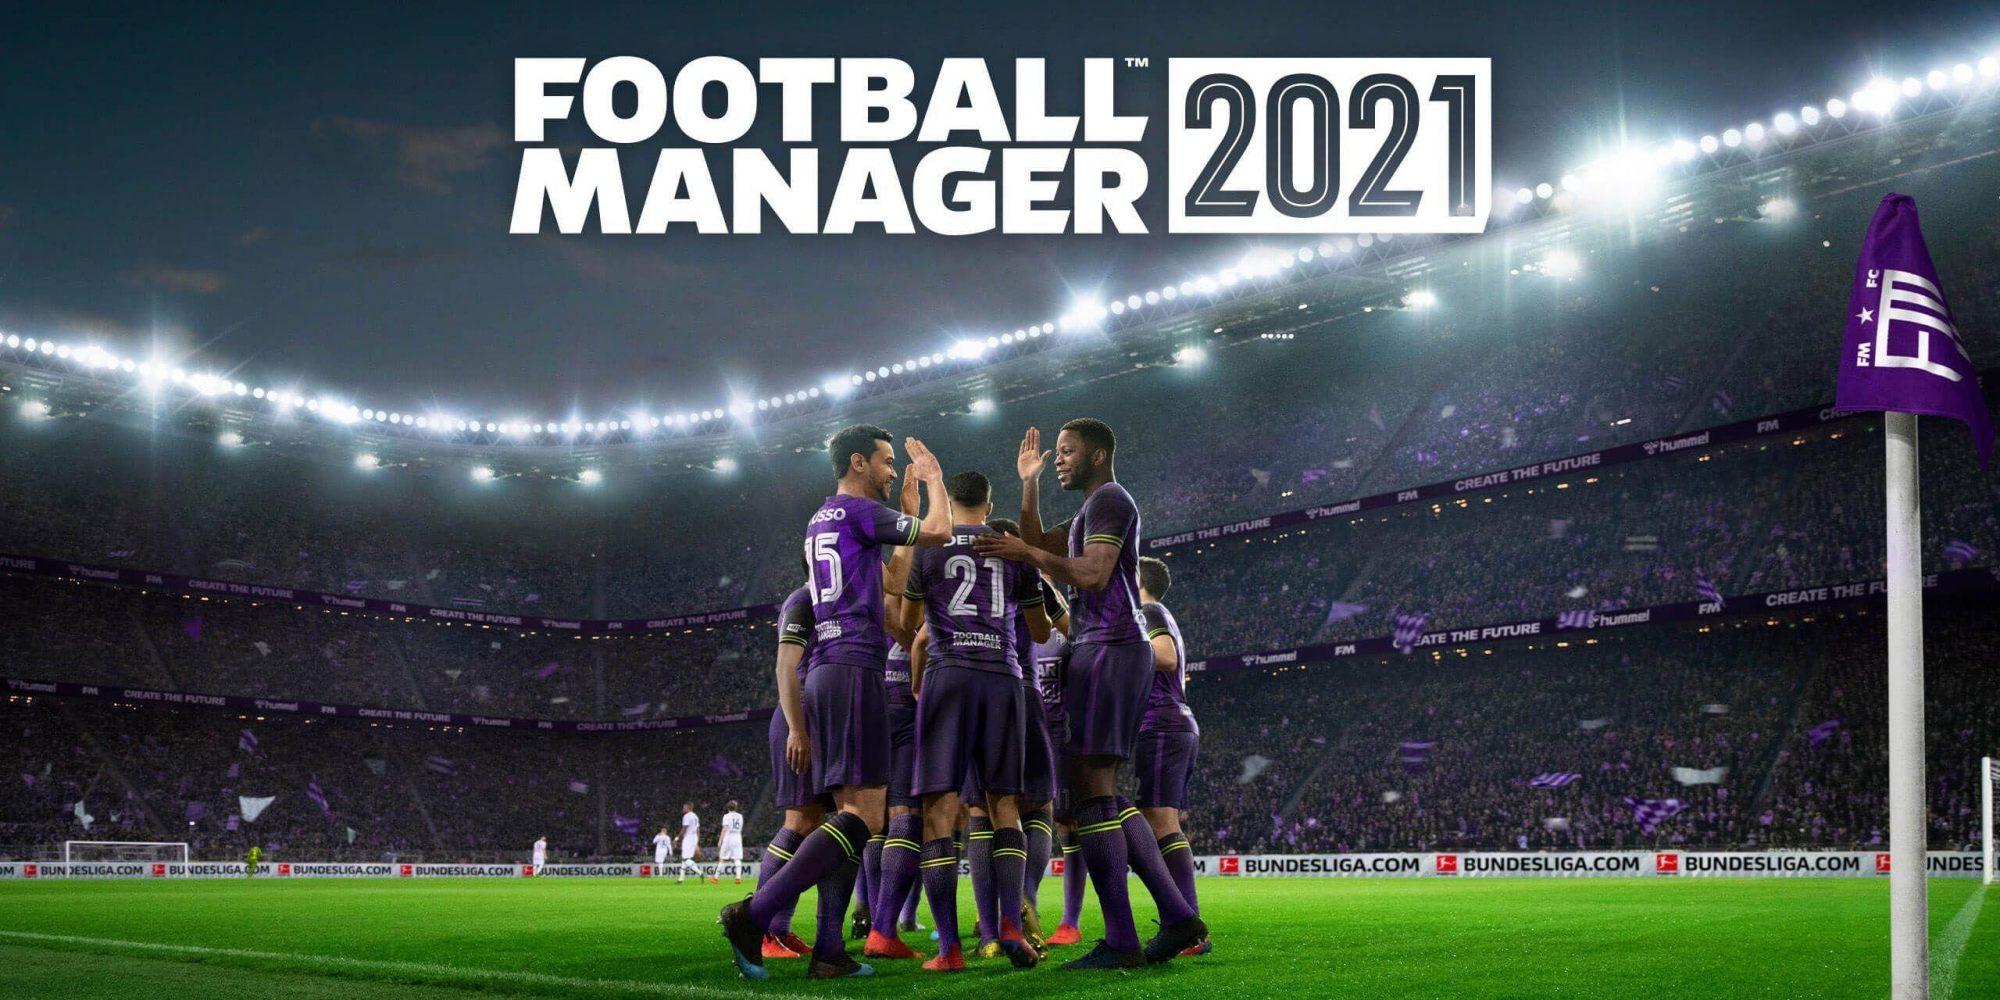 Ekstraklasa wkultowej  grze Football Manager 2021